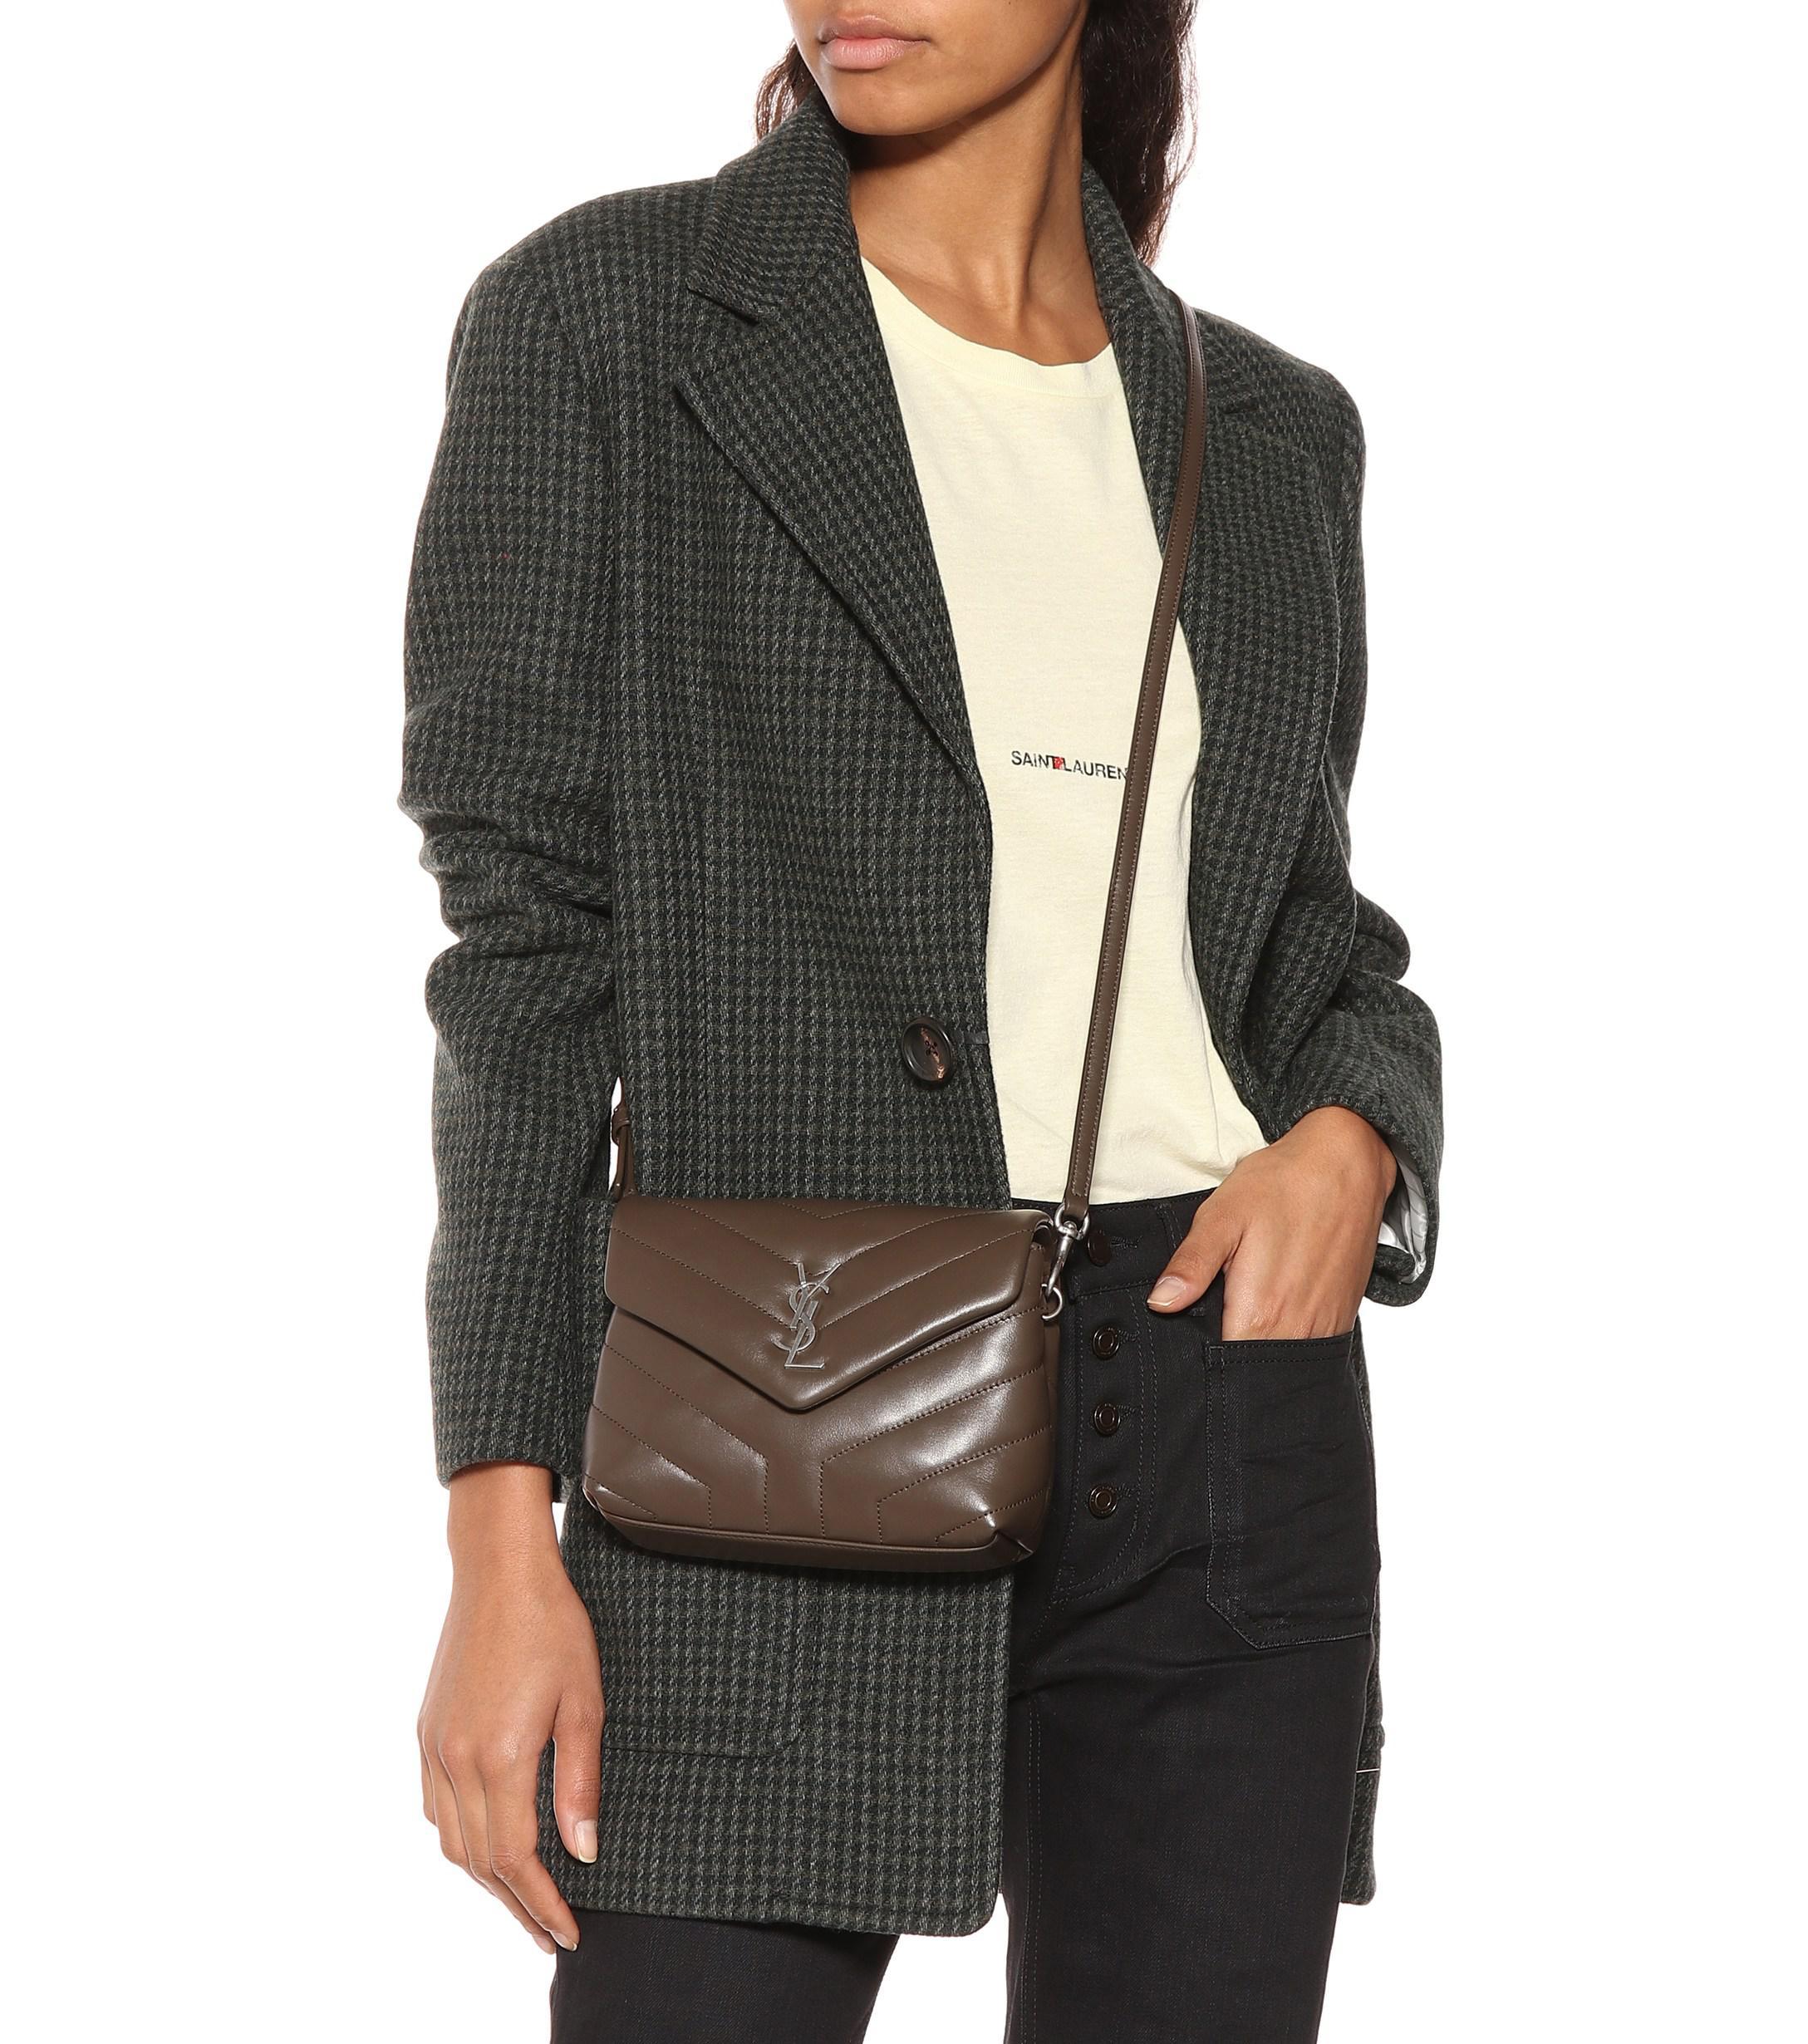 75c9ac6e4b6 Saint Laurent - Brown Toy Loulou Leather Shoulder Bag - Lyst. View  fullscreen